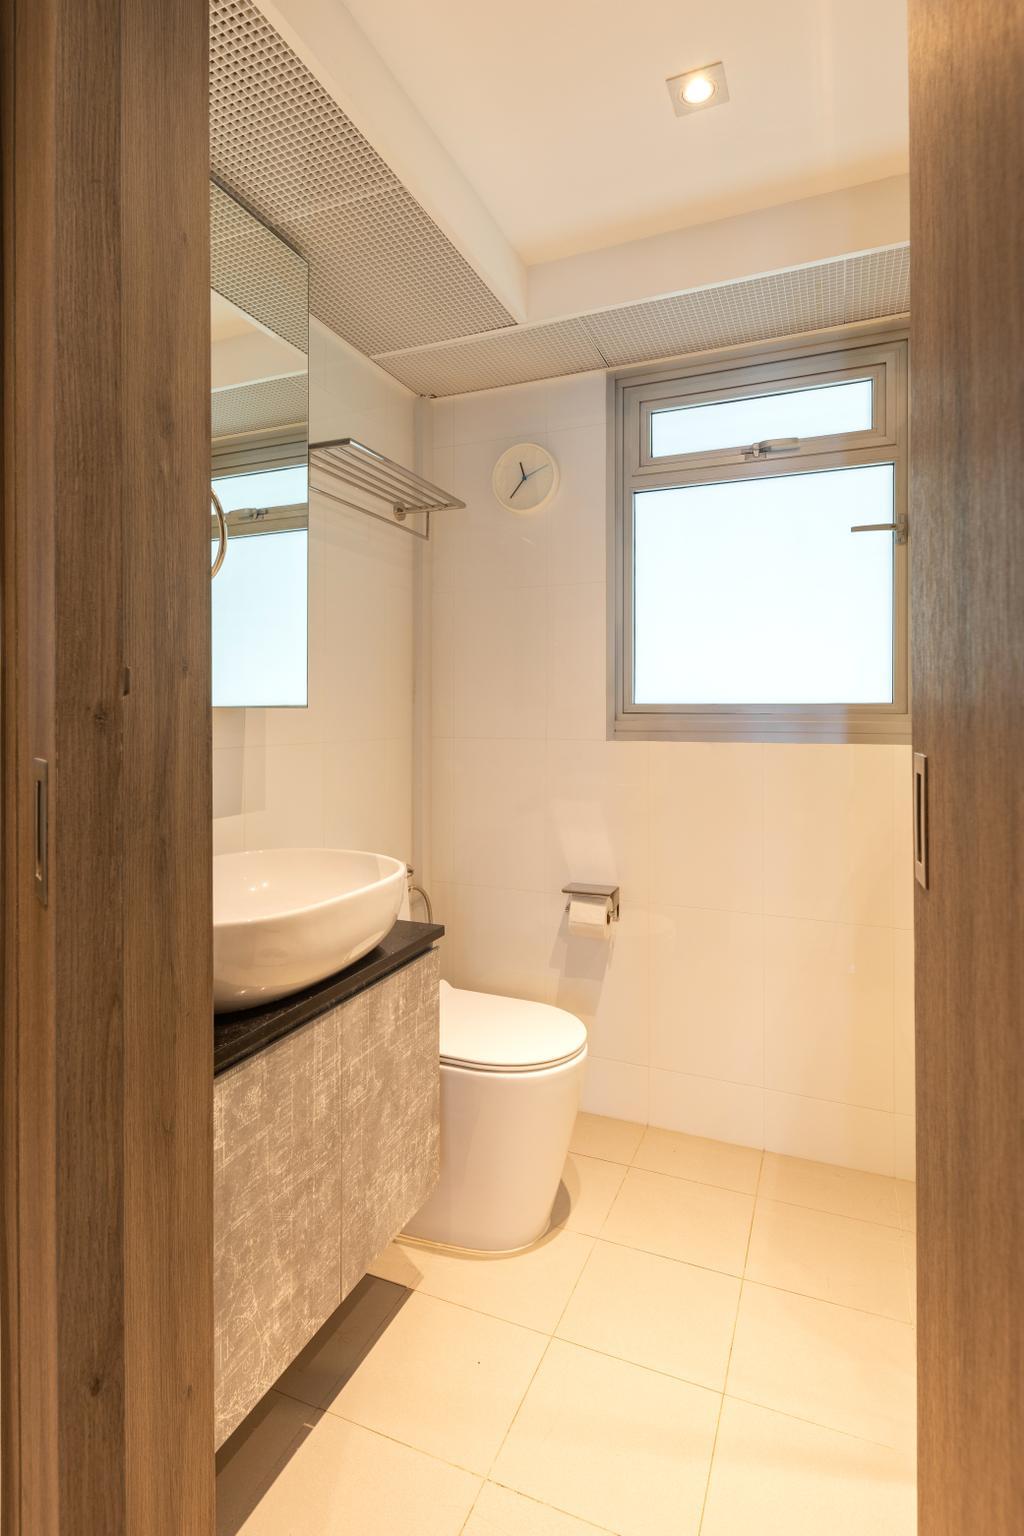 Transitional, HDB, Bathroom, Sembawang Crescent, Interior Designer, Form & Space, Eclectic